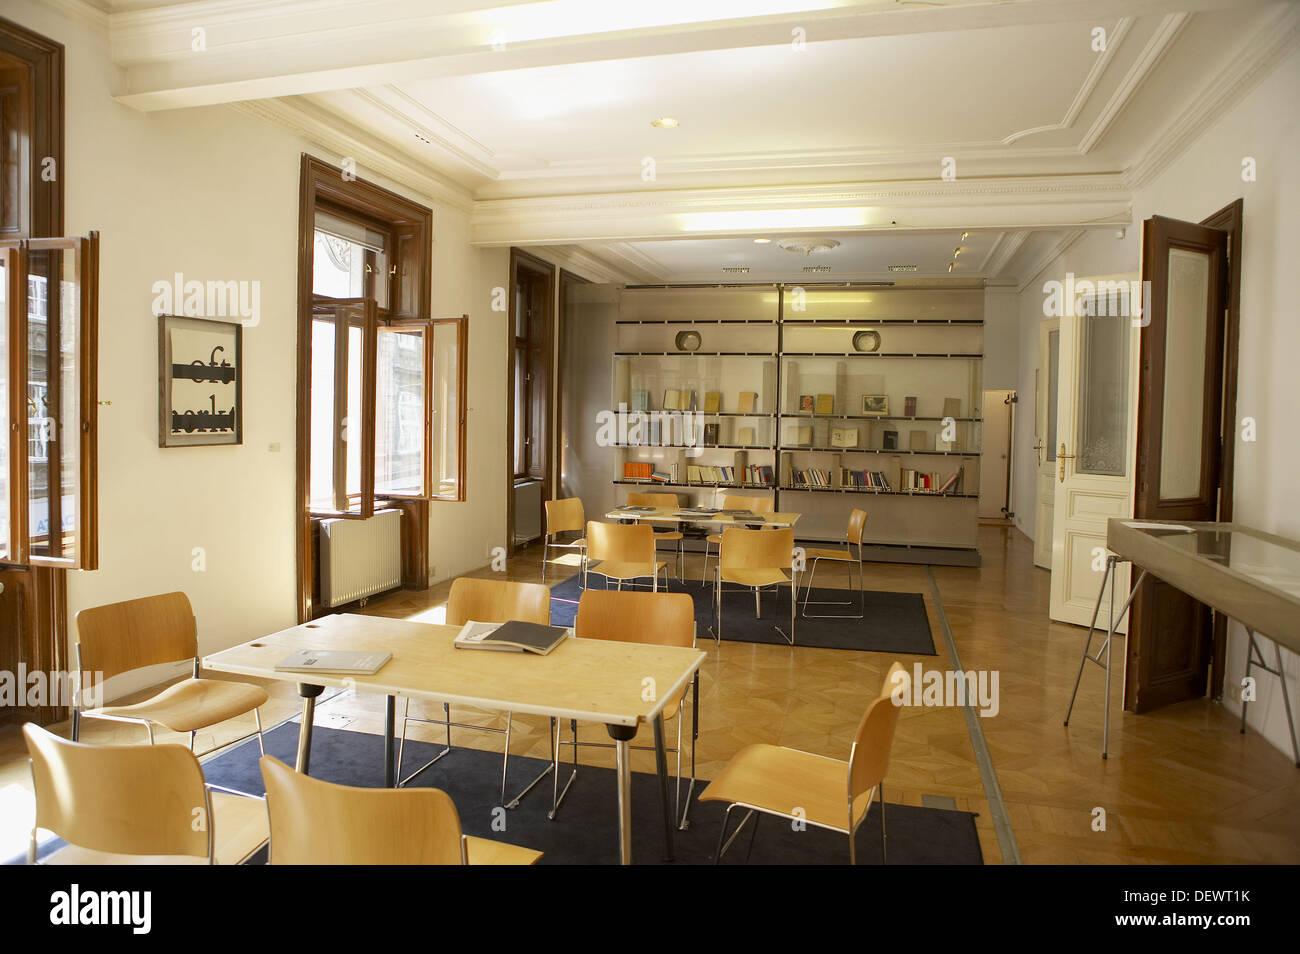 Sigmund Freud Museum, Vienna. Austria - Stock Image